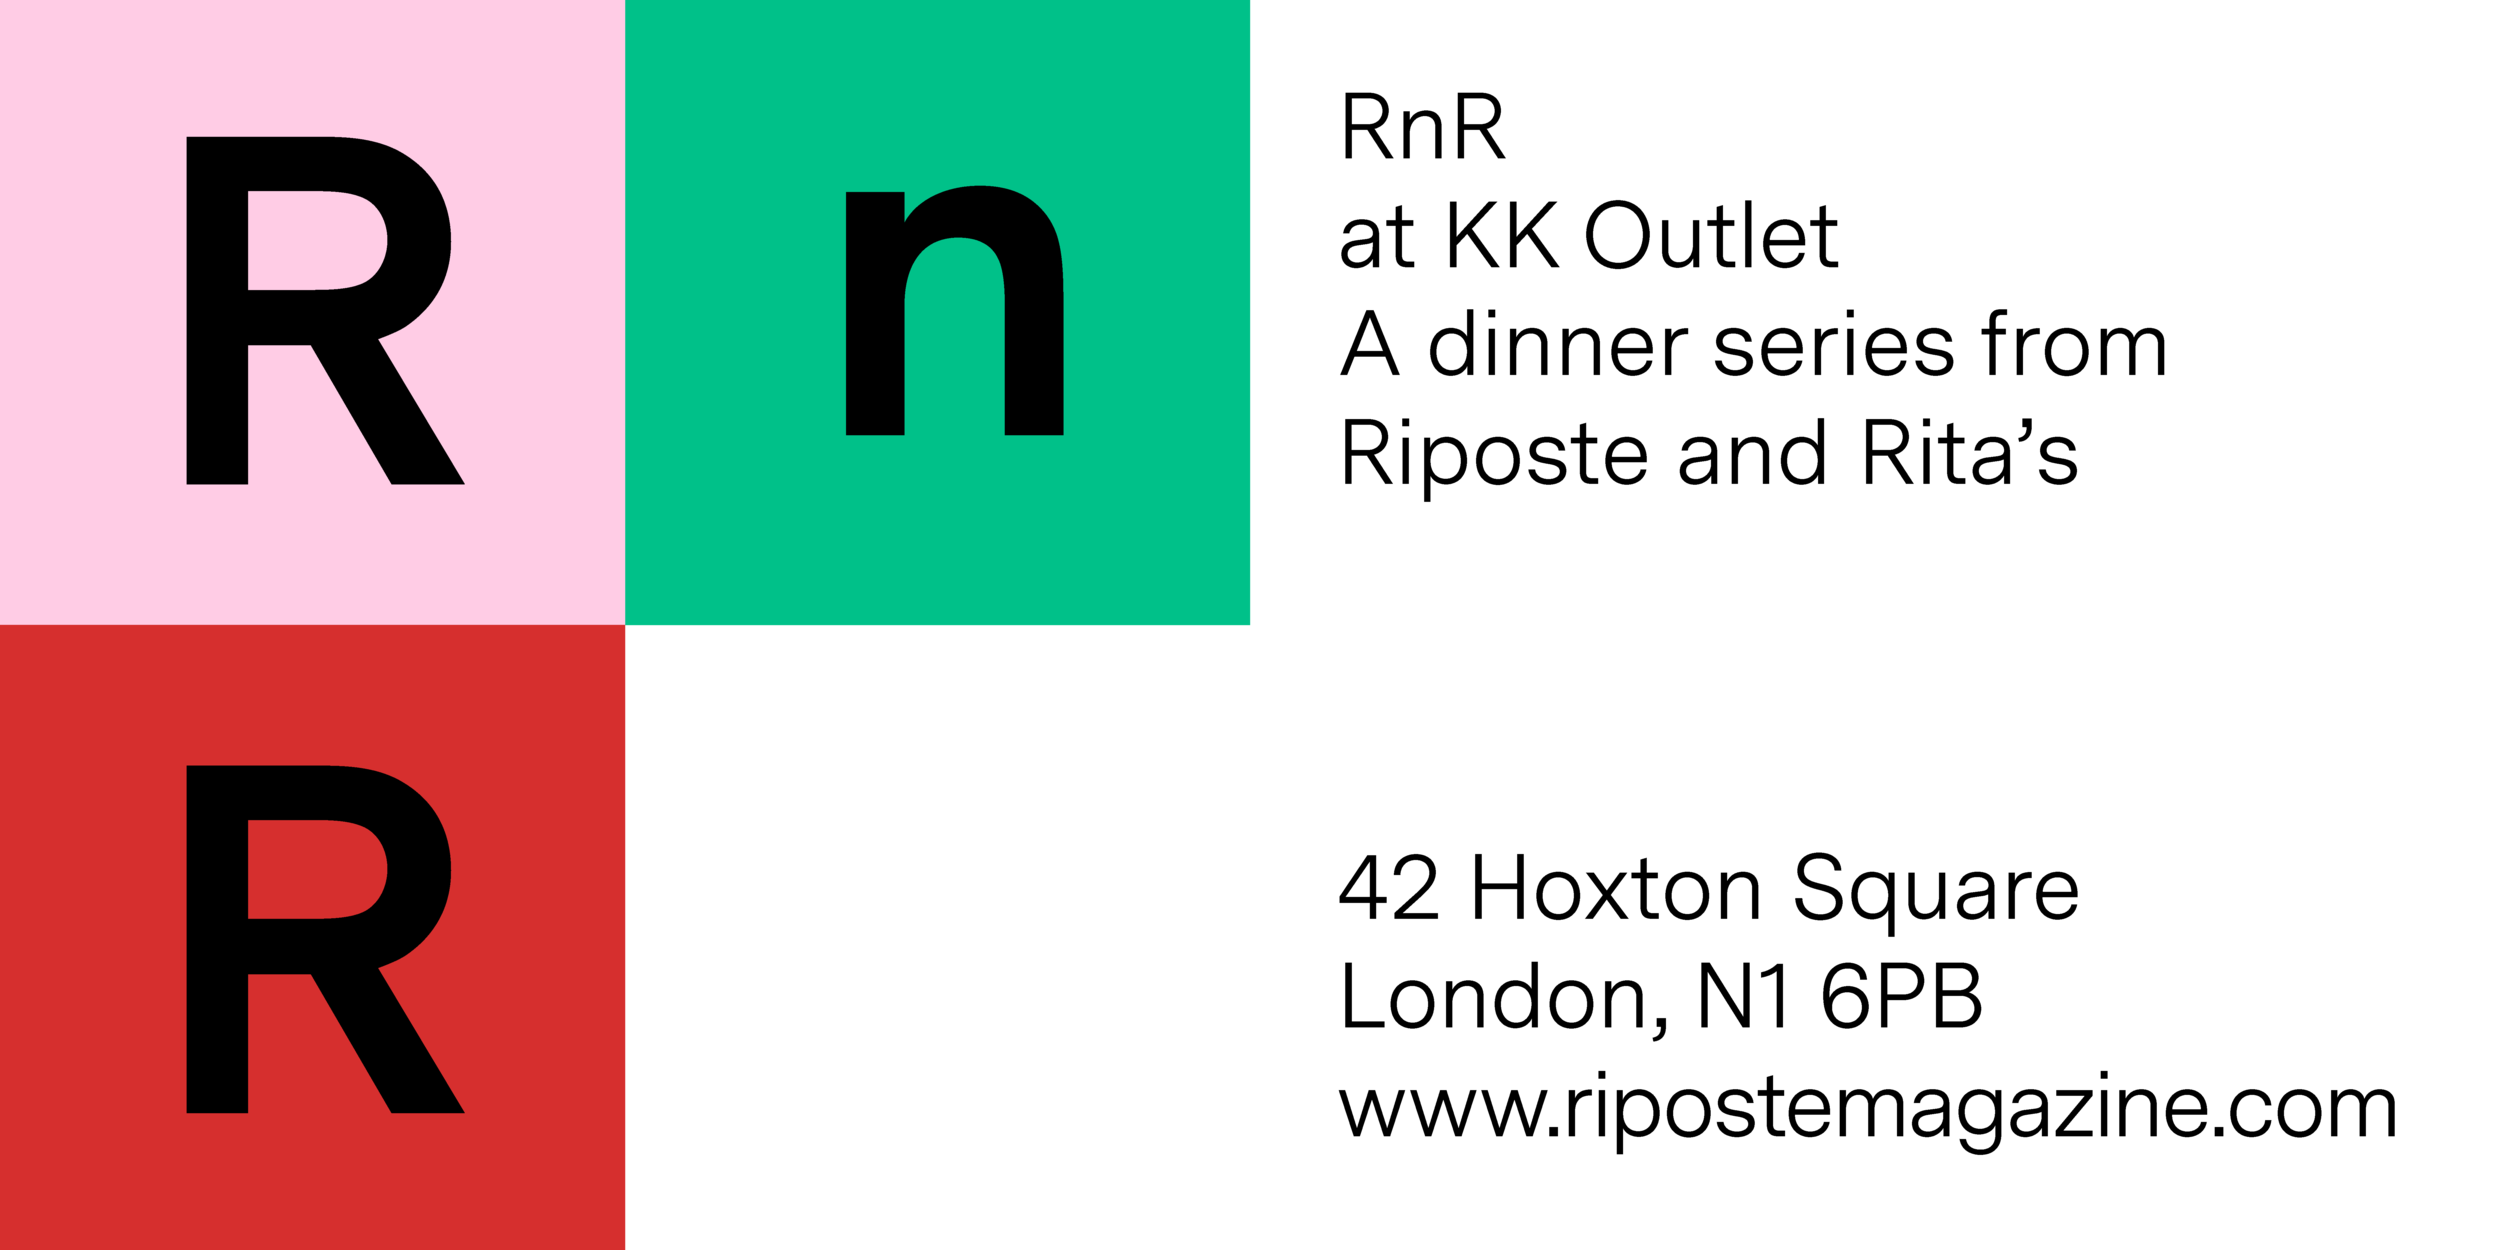 Riposte_Header_web_RnR.png